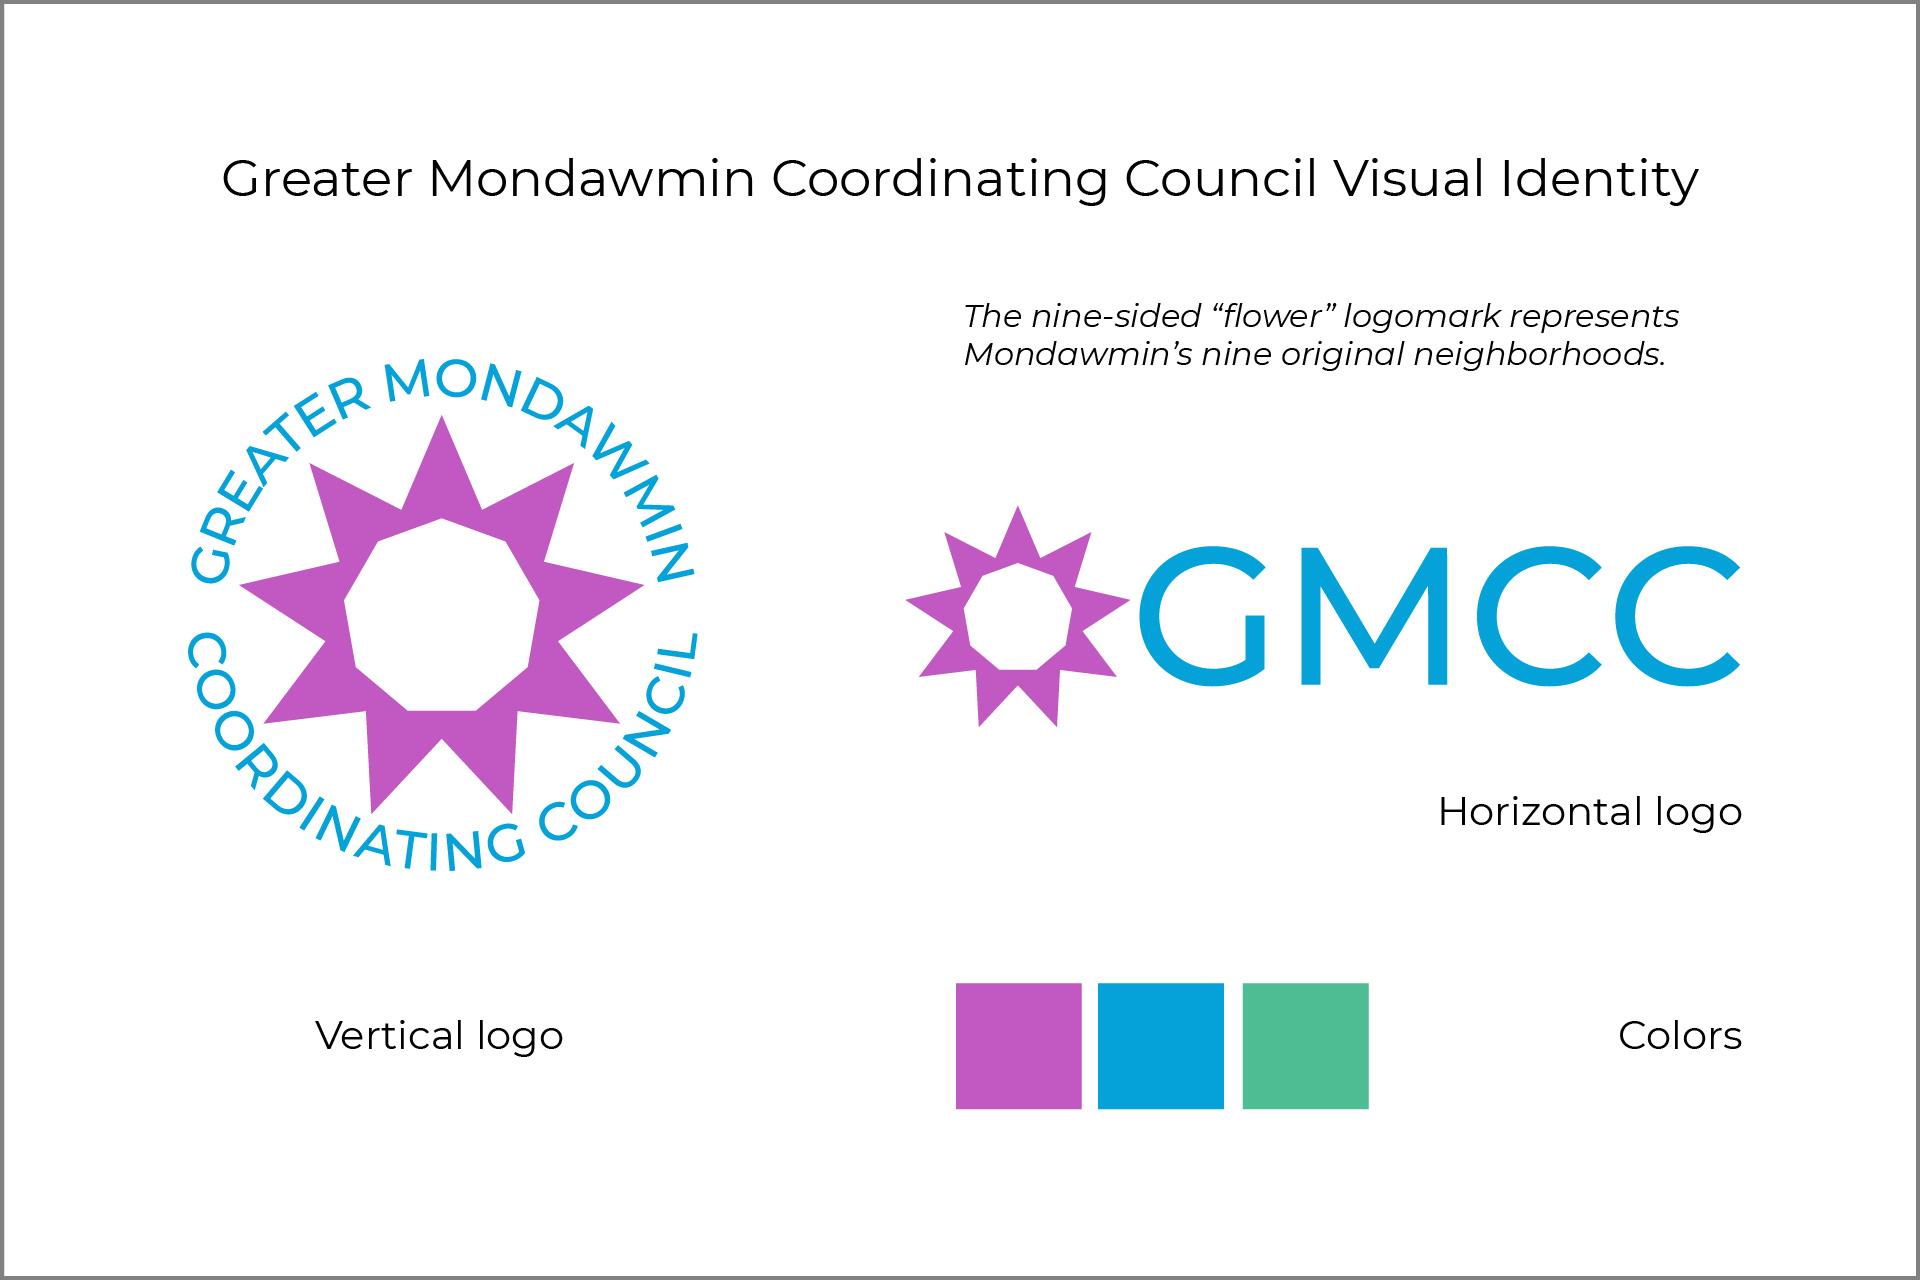 GMCC visual identity